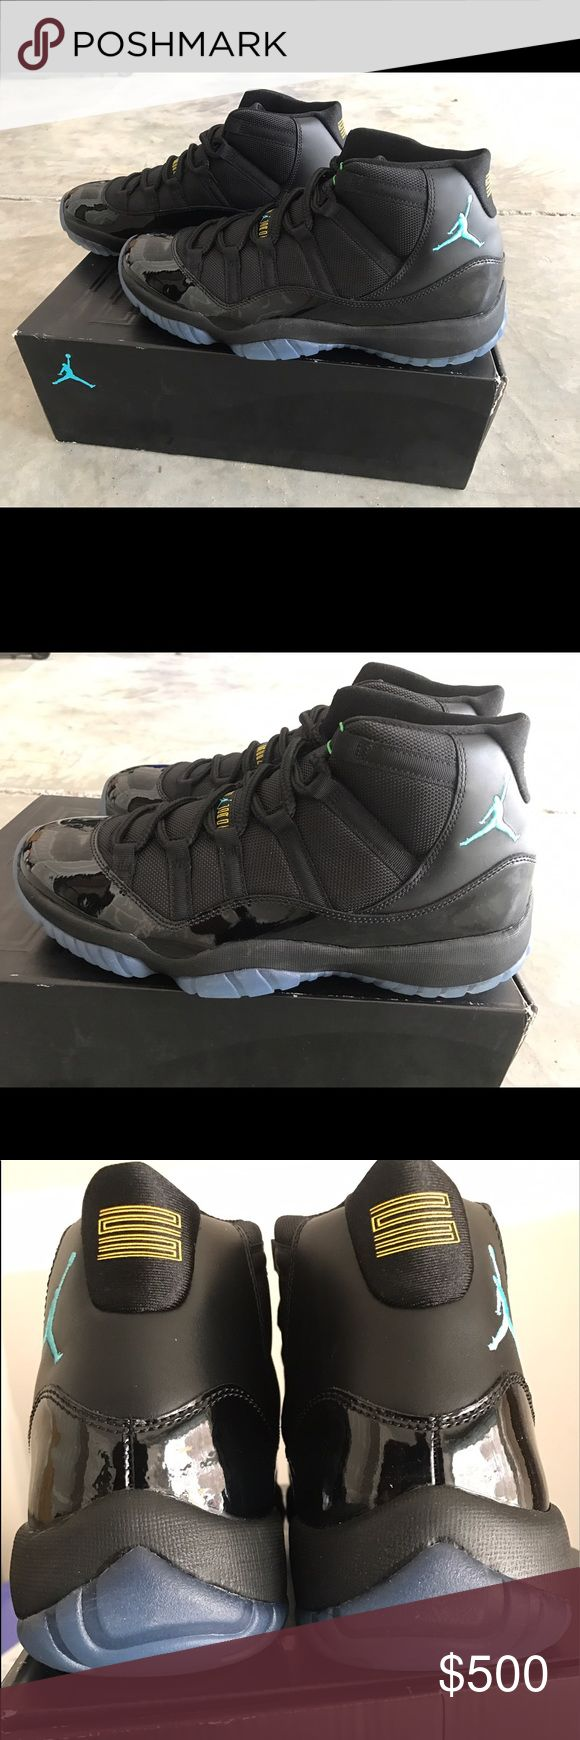 "Nike Air Jordan 11 Retro ""Gamma Blue"" This is an unworn, DEADSTOCK item, 100% AUTHENTIC, MEN'S SIZE 11.5 Jordan Shoes Sneakers"